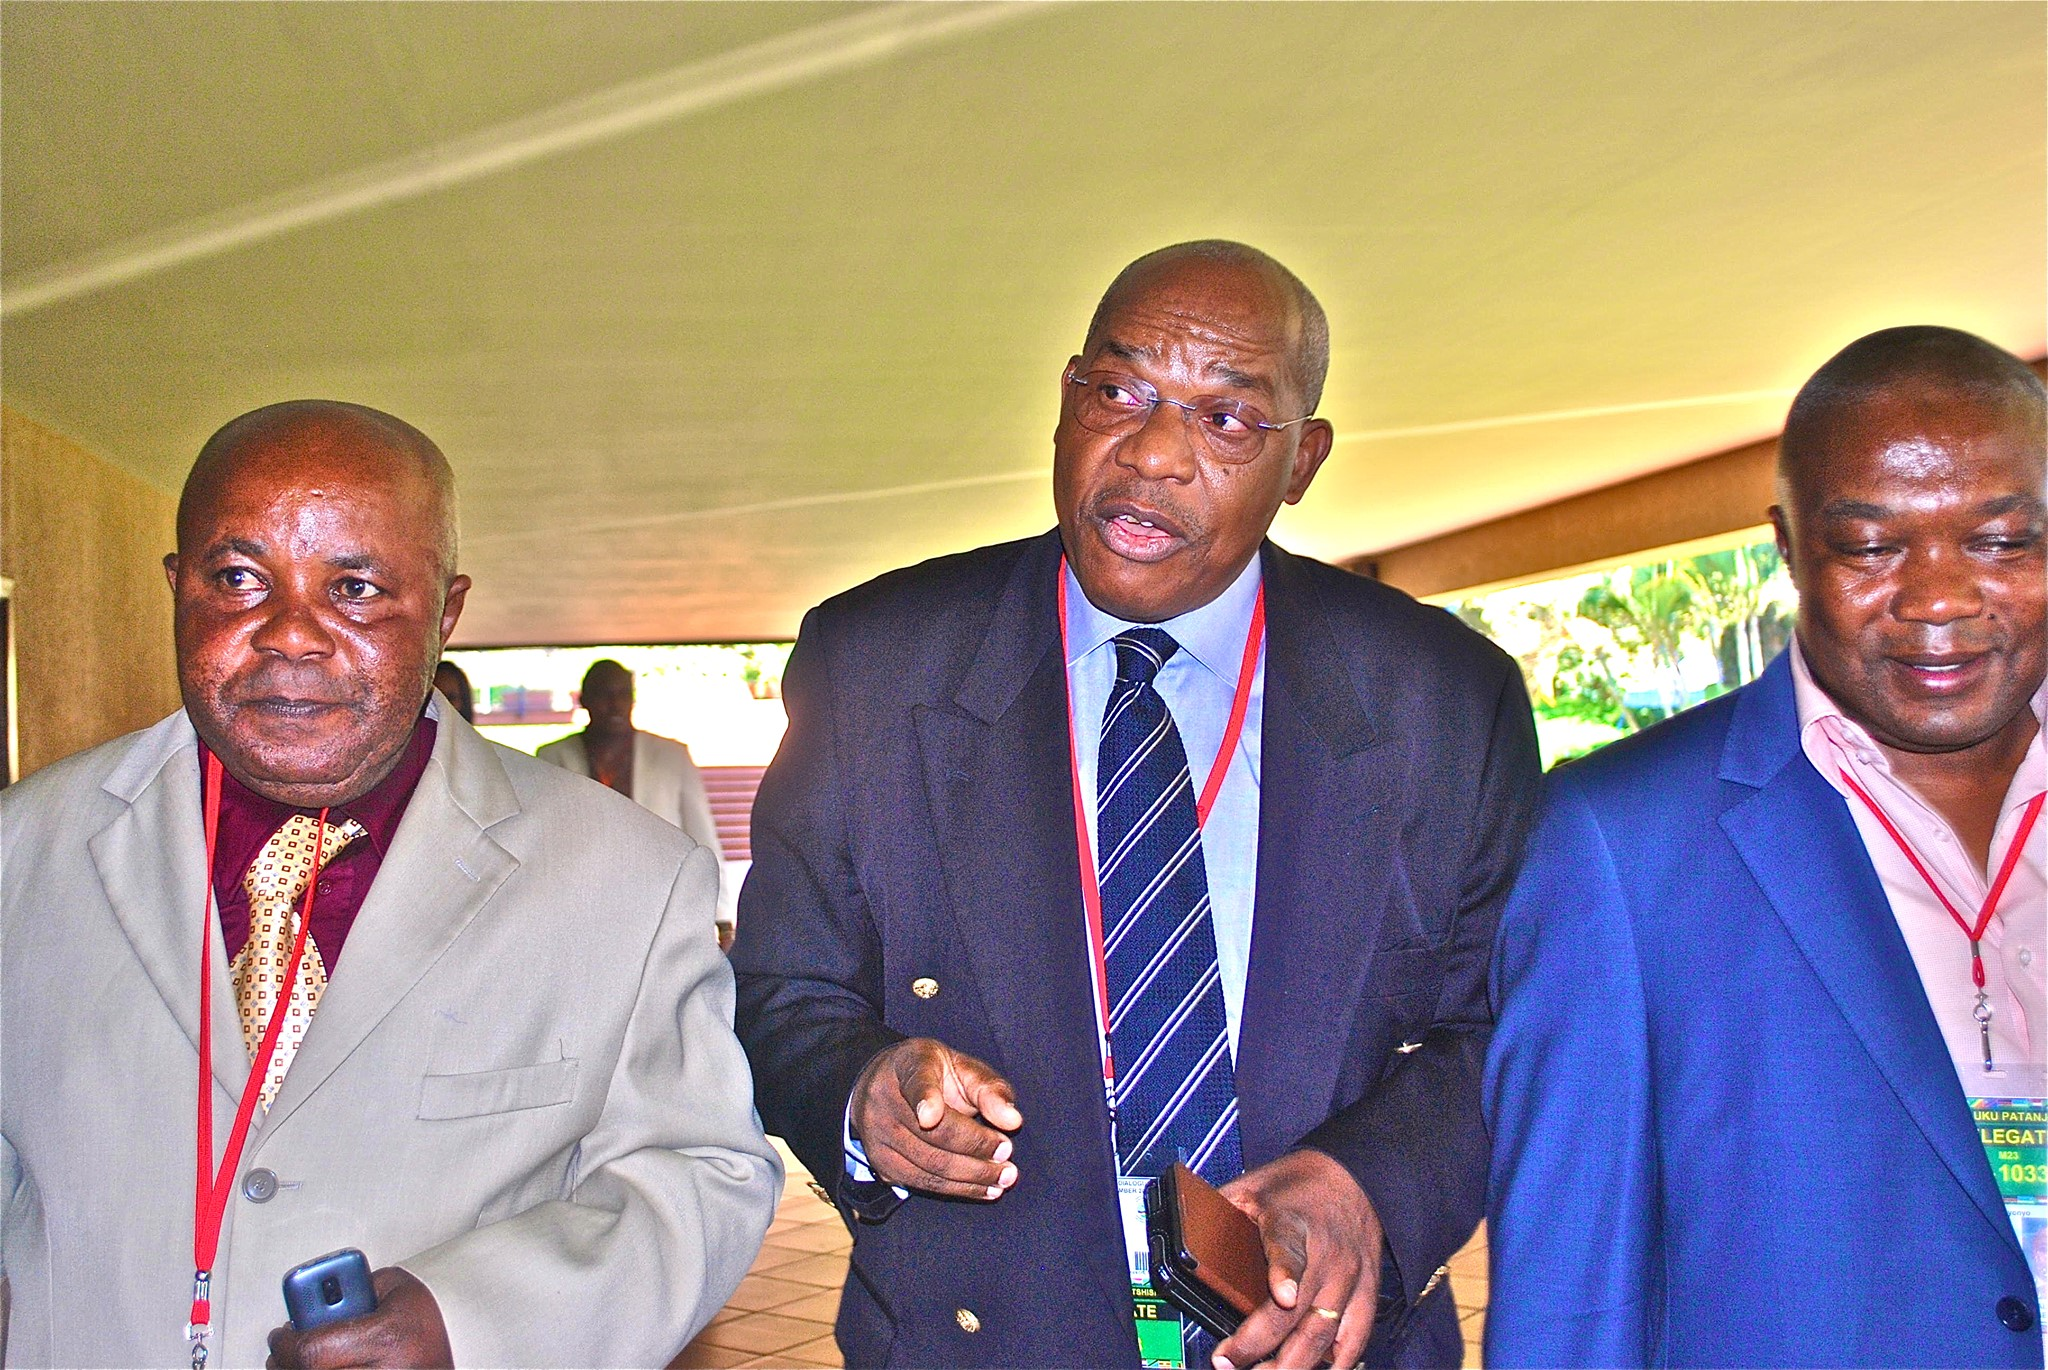 Francois Mwamba au milieu et les ex-M23 Kambasu Ngeve(gauche) et Ady Patanjila(droite)/Photo Magloire Paluku Kampala 2013